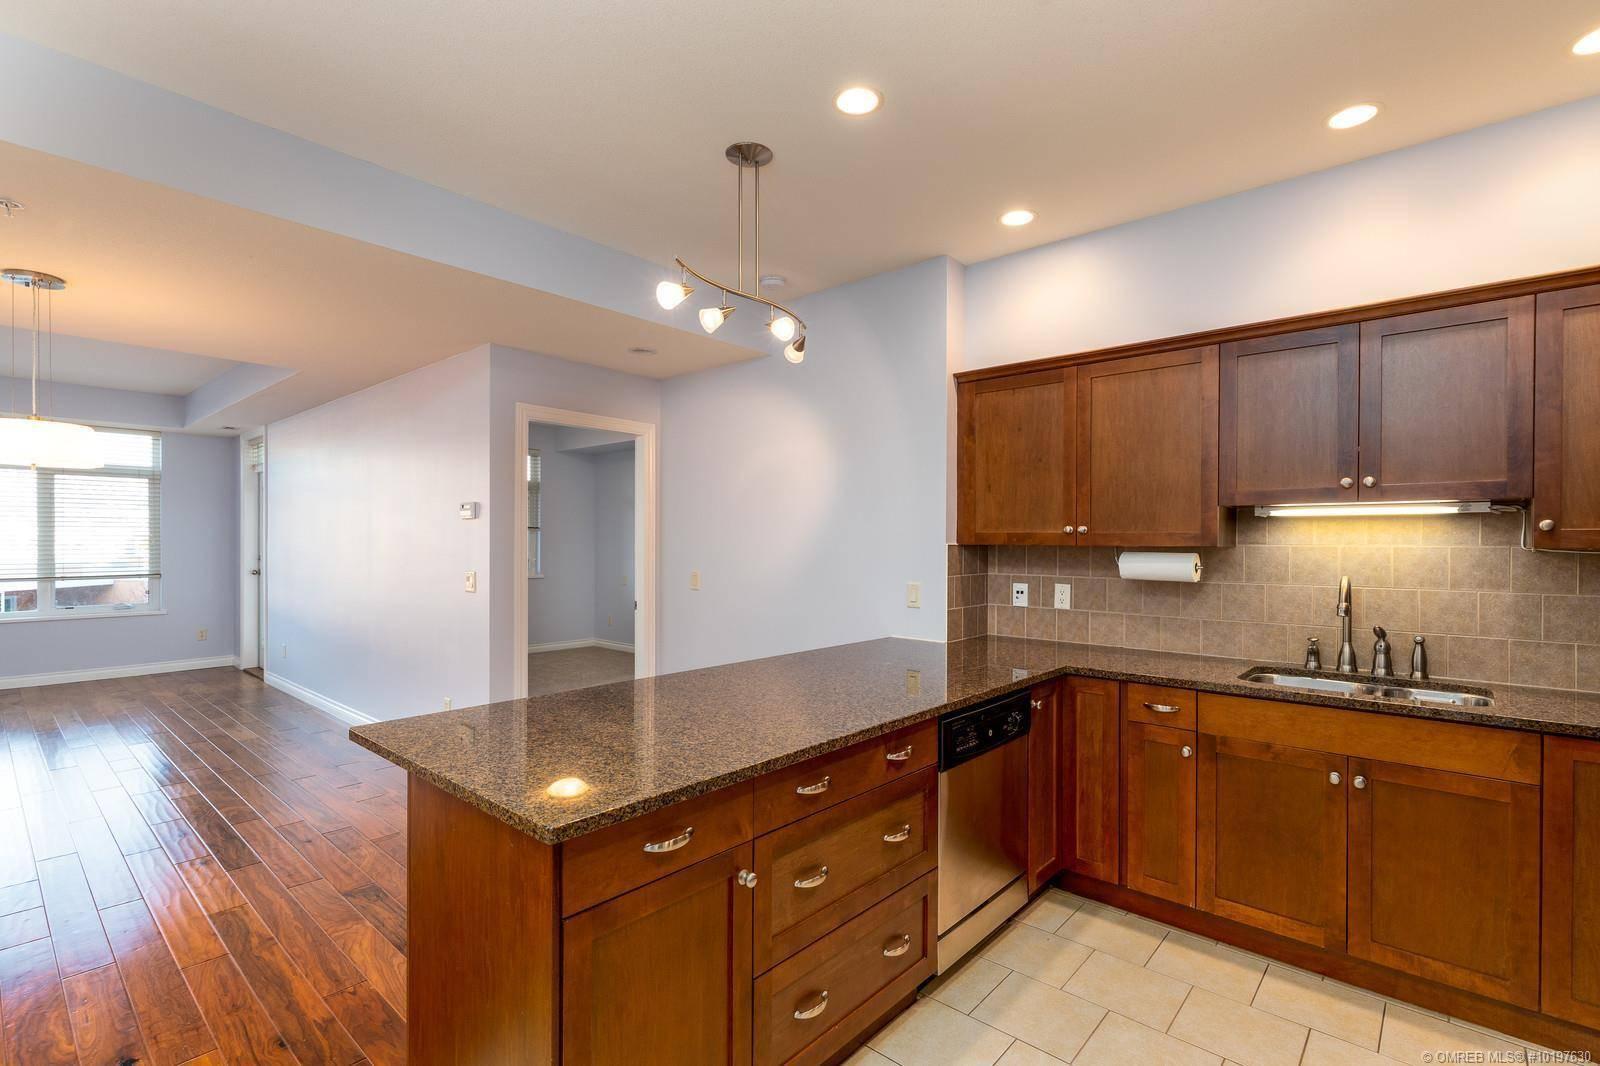 Condo for sale at 3832 Old Okanagan Hy Unit 3204 West Kelowna British Columbia - MLS: 10197630